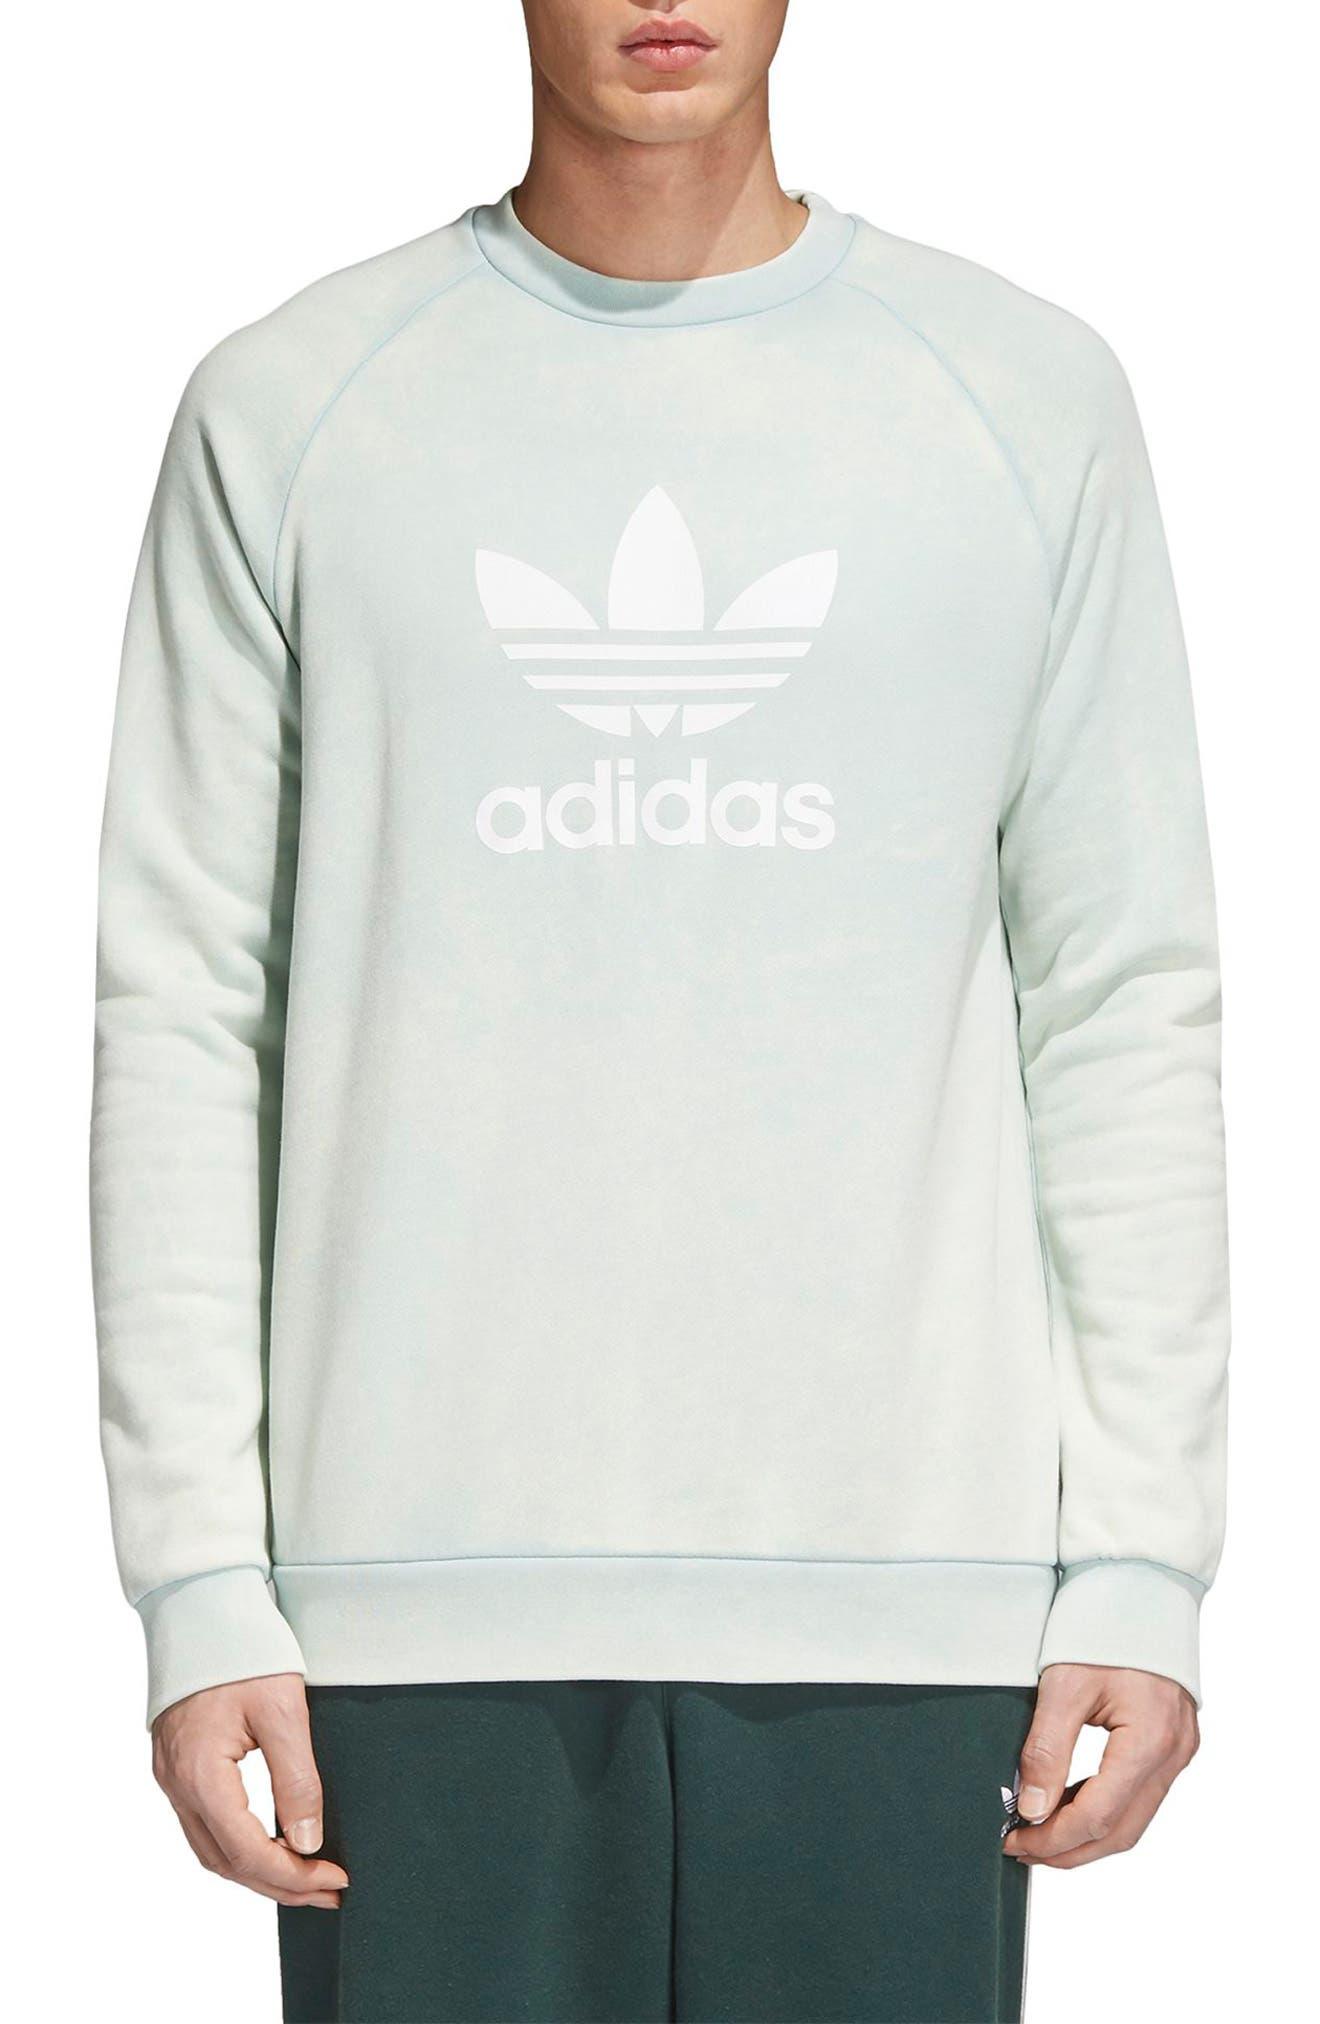 Trefoil Crewneck Sweatshirt,                             Main thumbnail 1, color,                             339